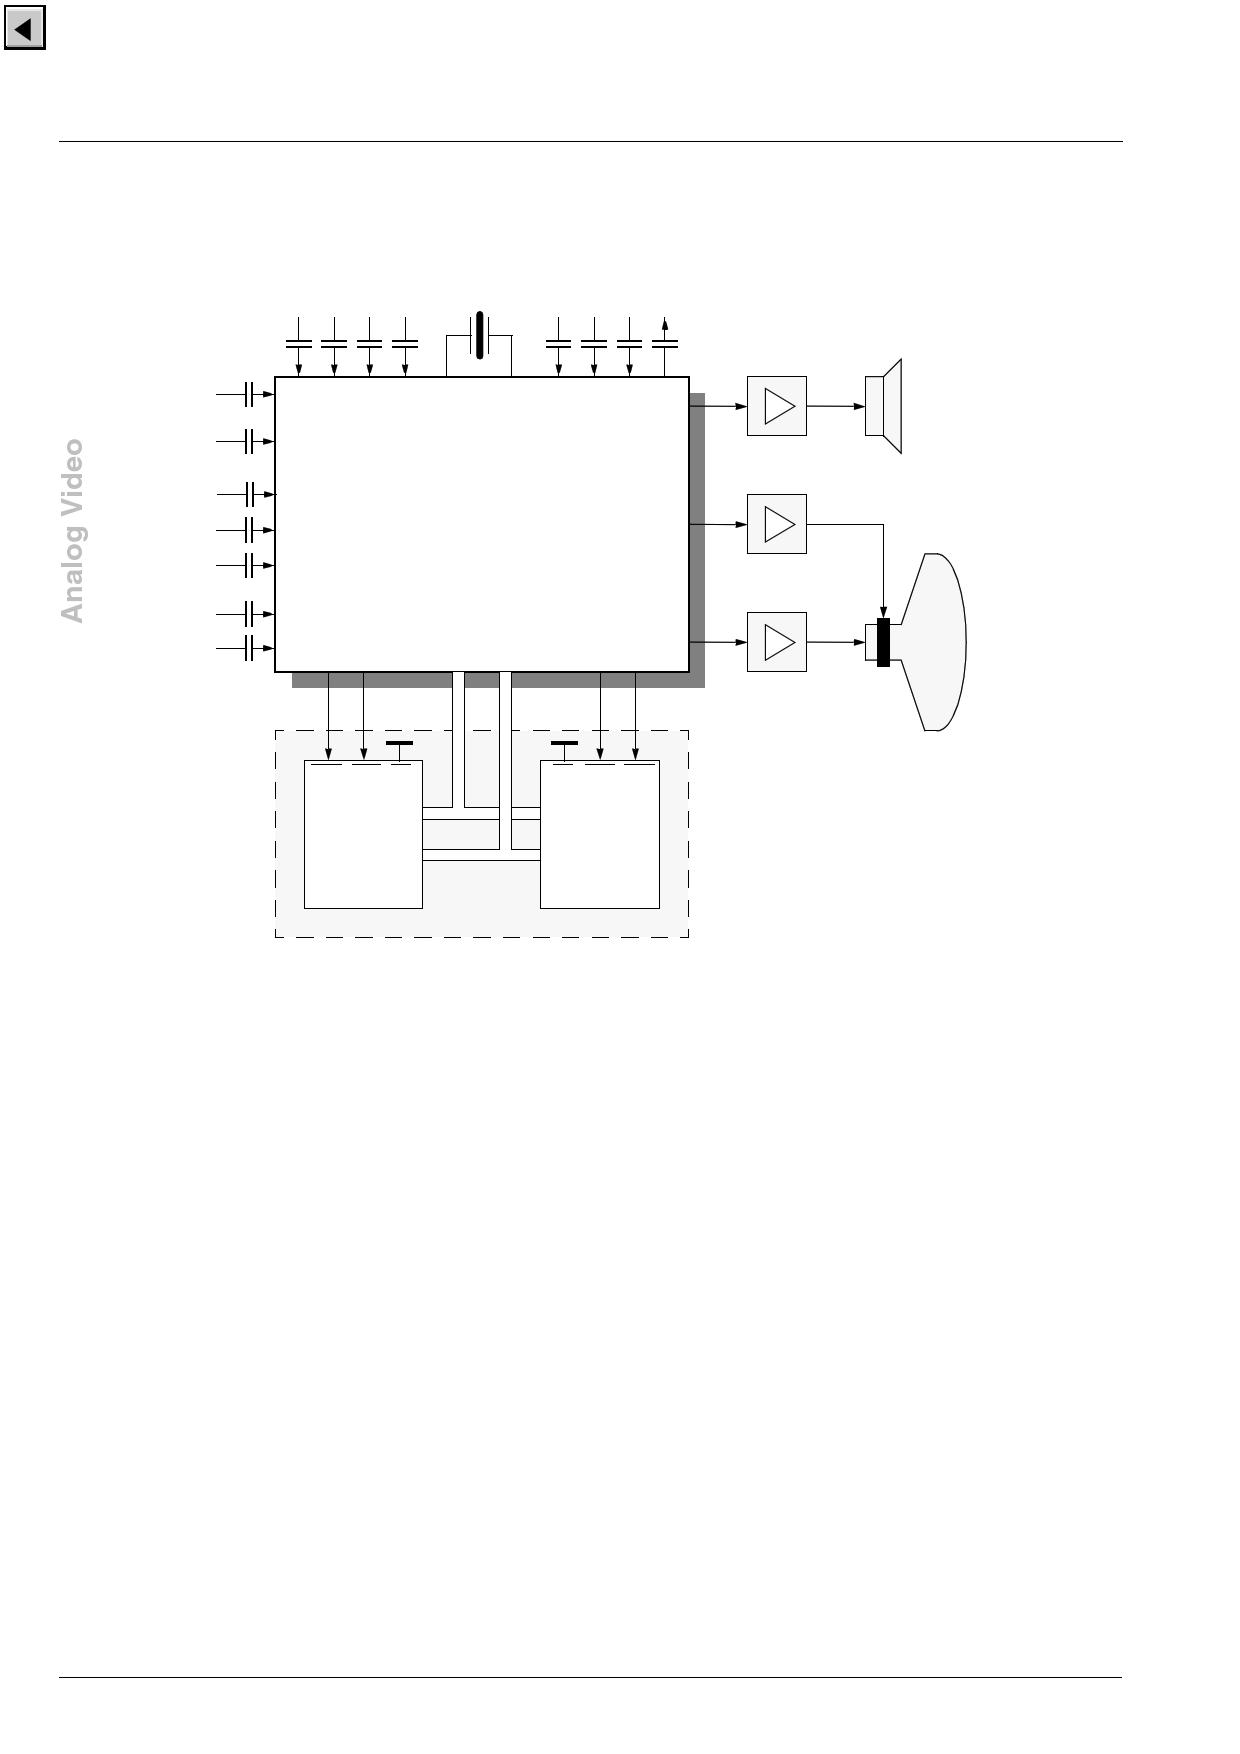 VCT3832A arduino